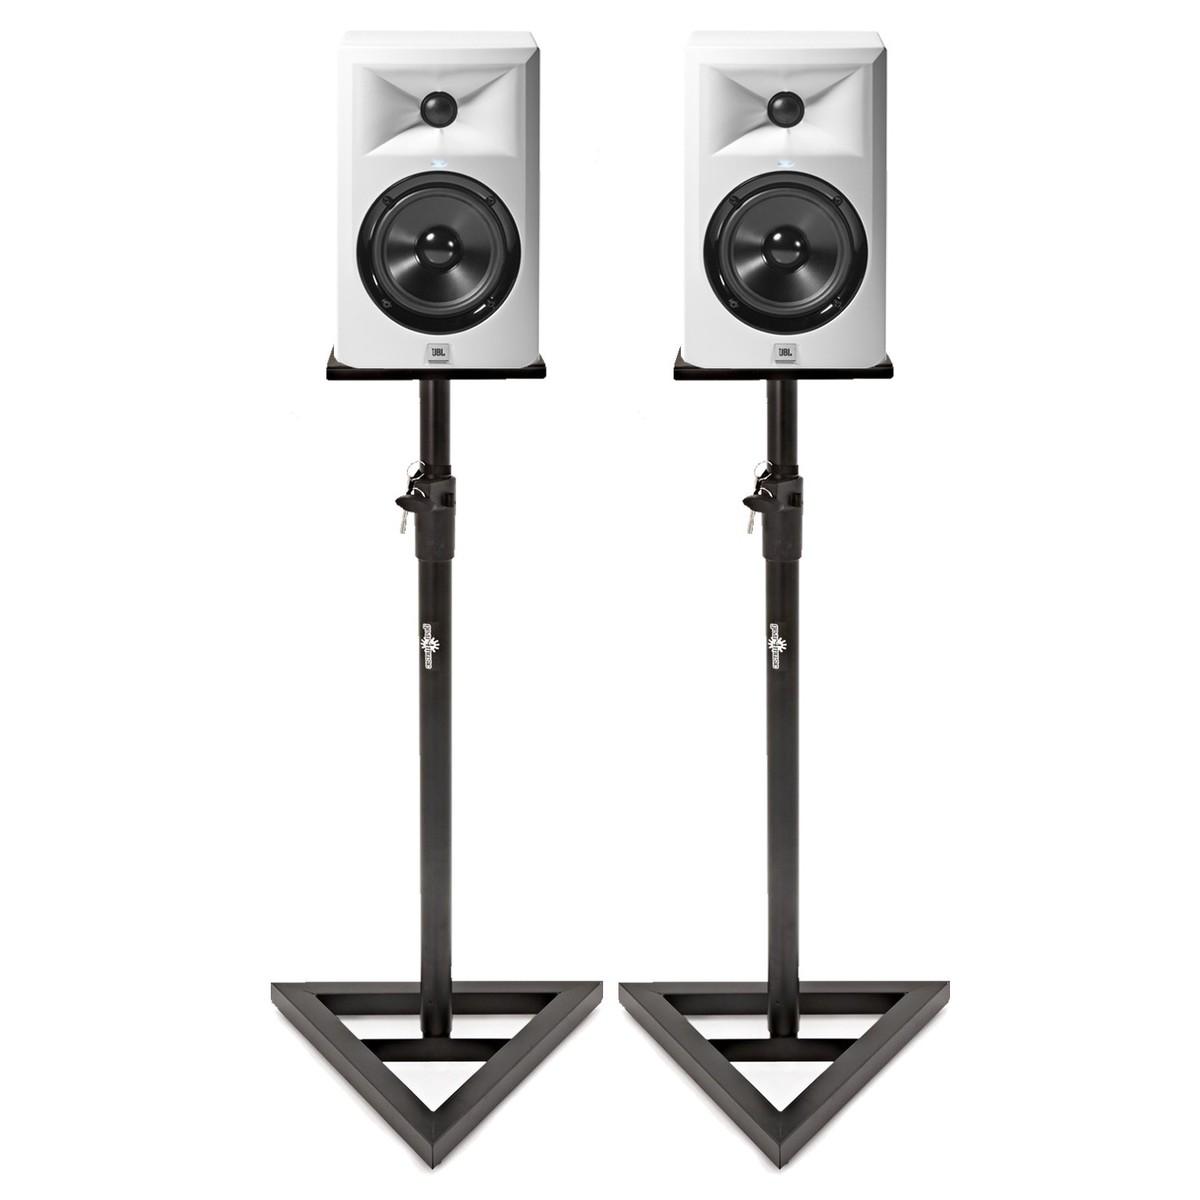 jbl lsr305 enceintes de monitoring blanches paire avec. Black Bedroom Furniture Sets. Home Design Ideas